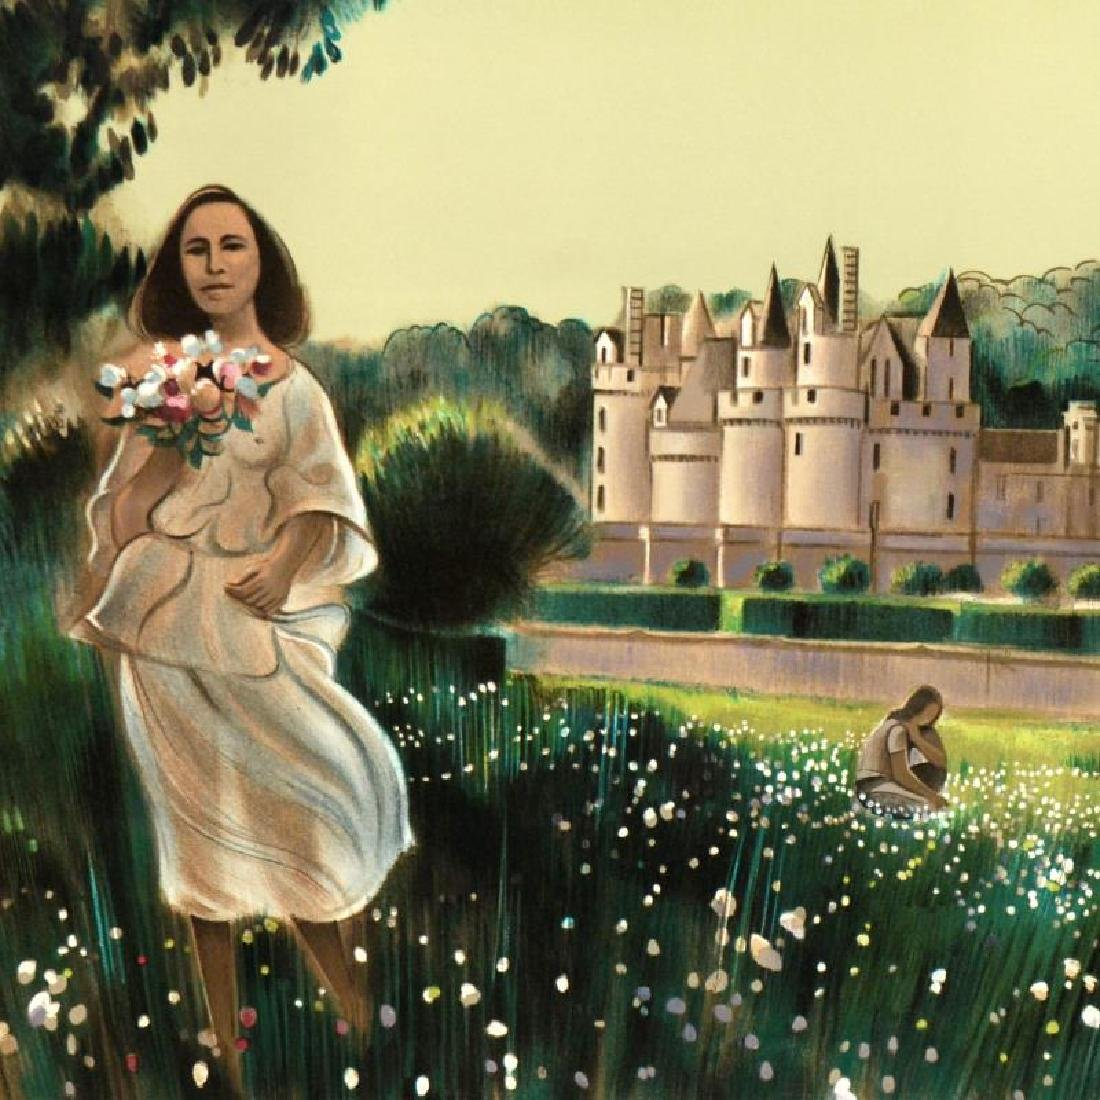 Summer Flowers by Vernet Bonfort, Robert - 2